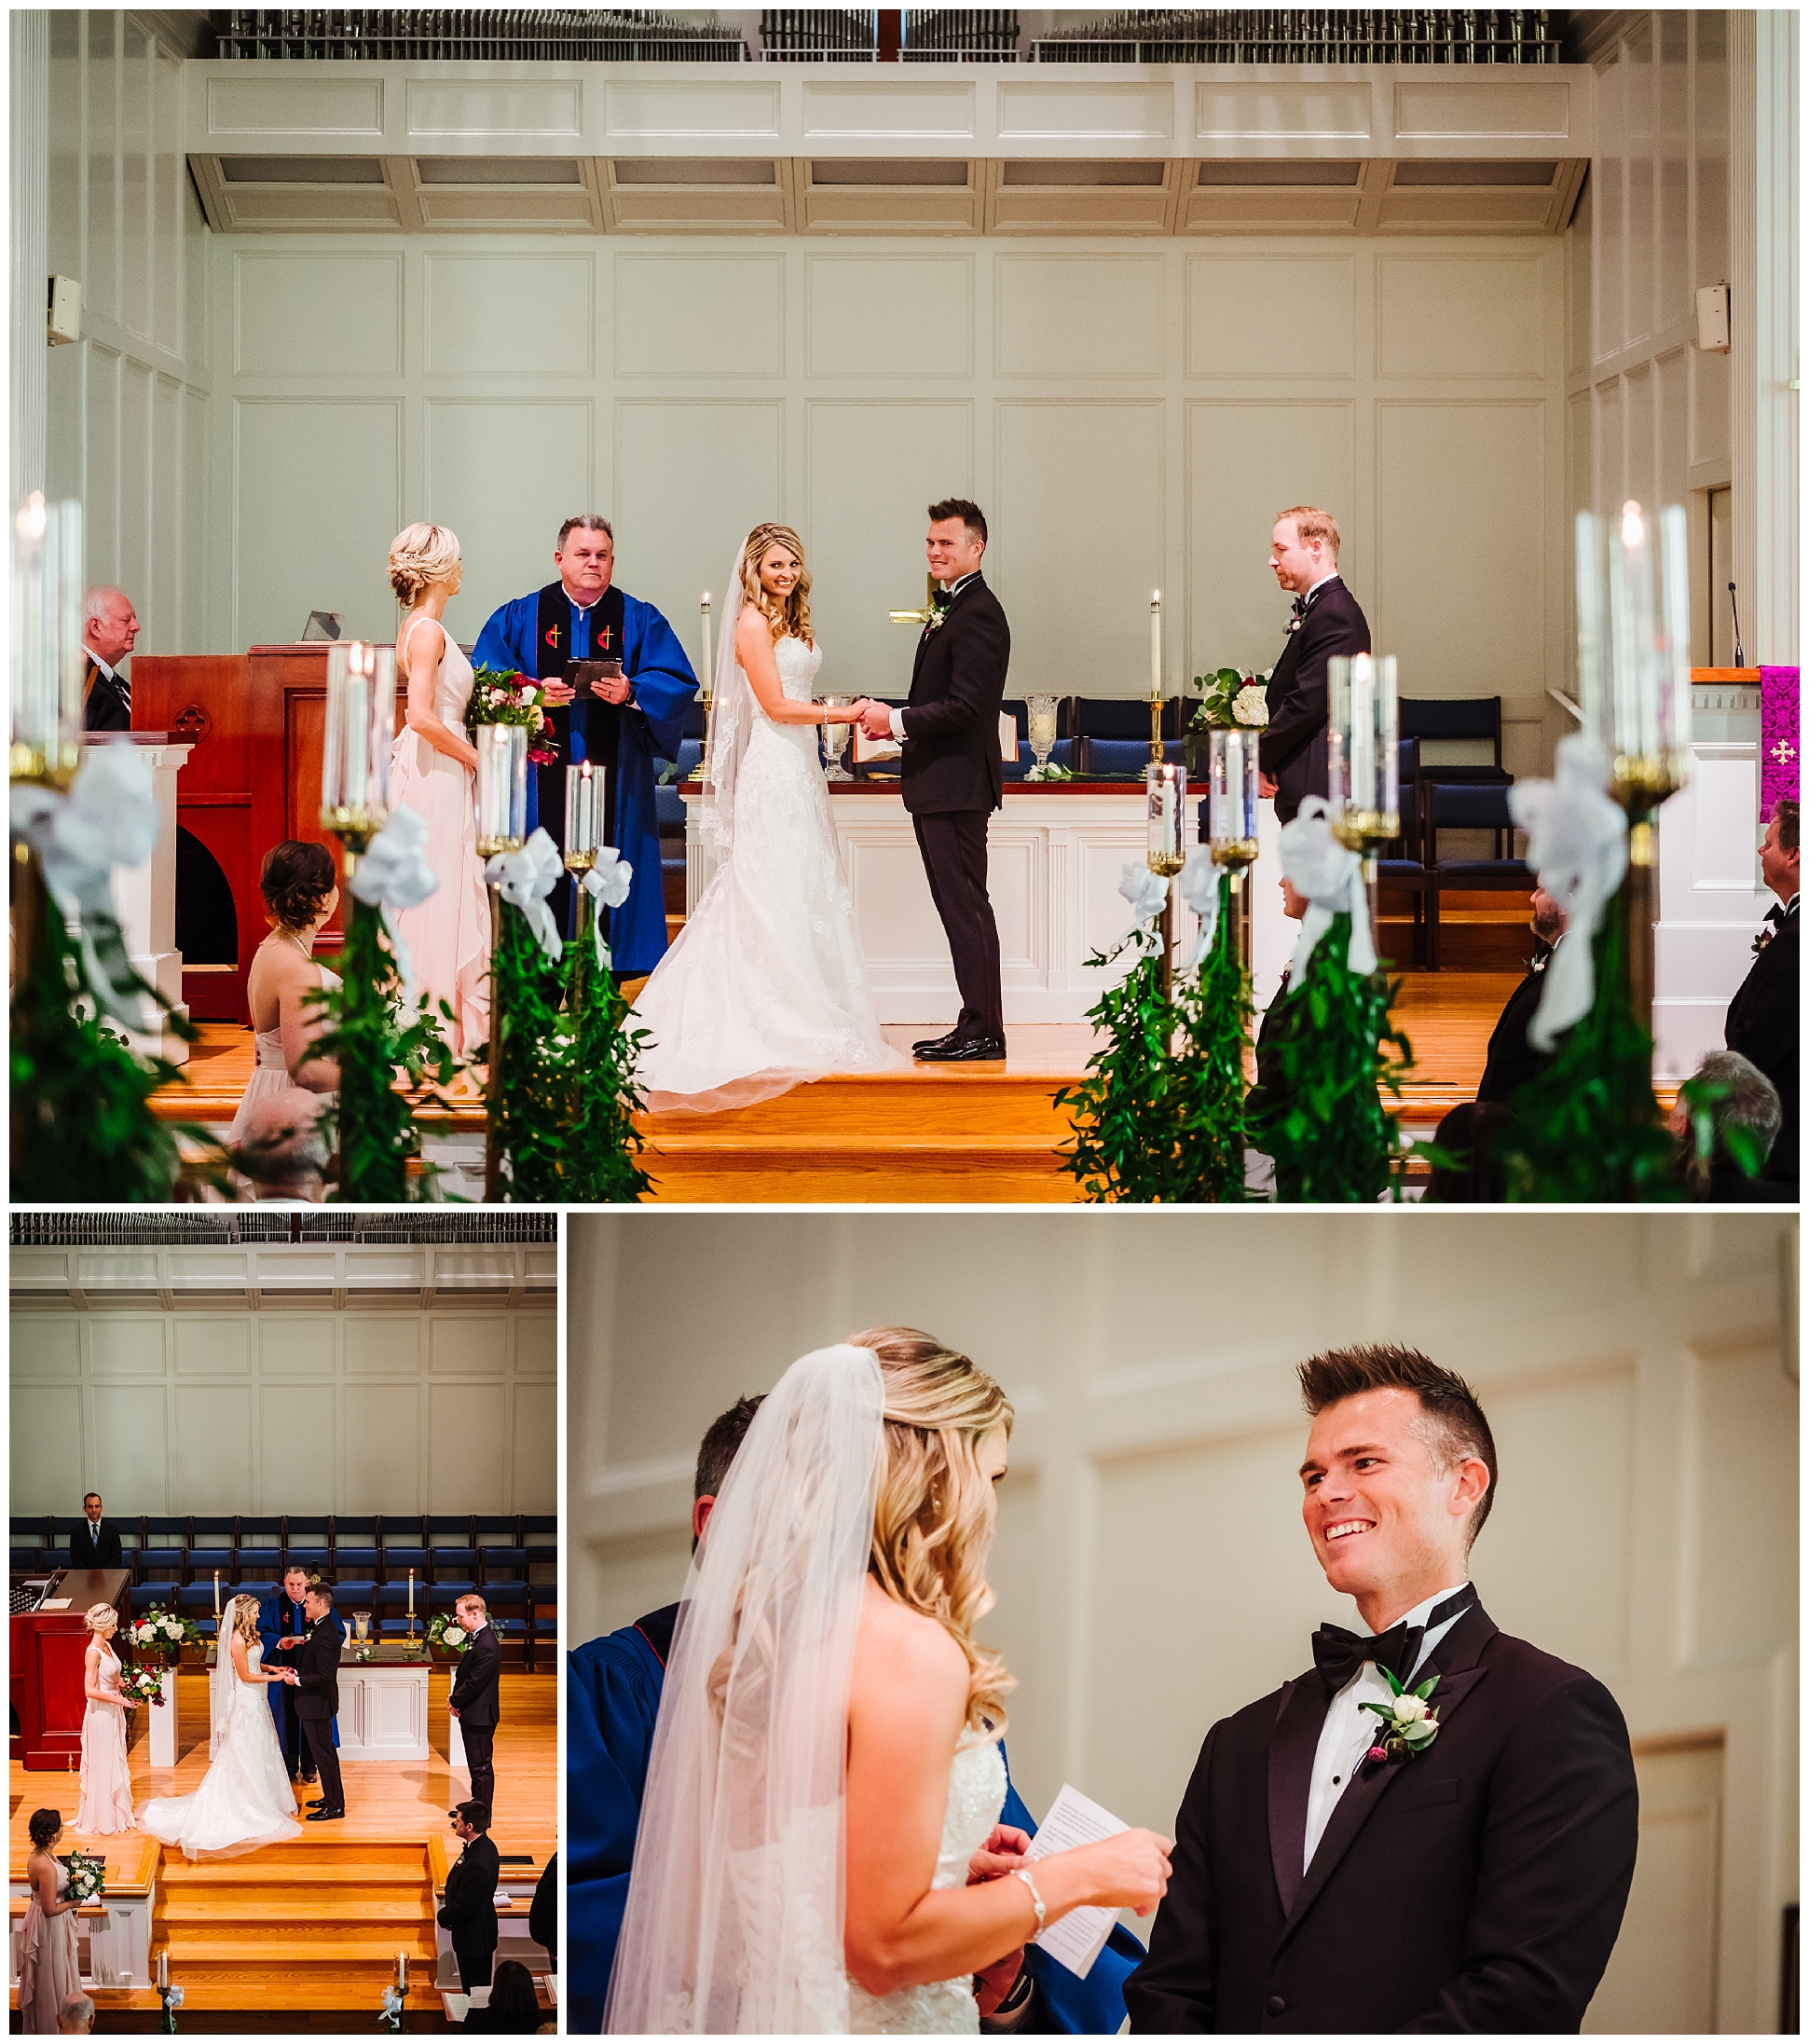 tampa-bradenton-wedding-photographer-south-florida-museum-classic-blush-gold-alpacas-sparklers_0050.jpg